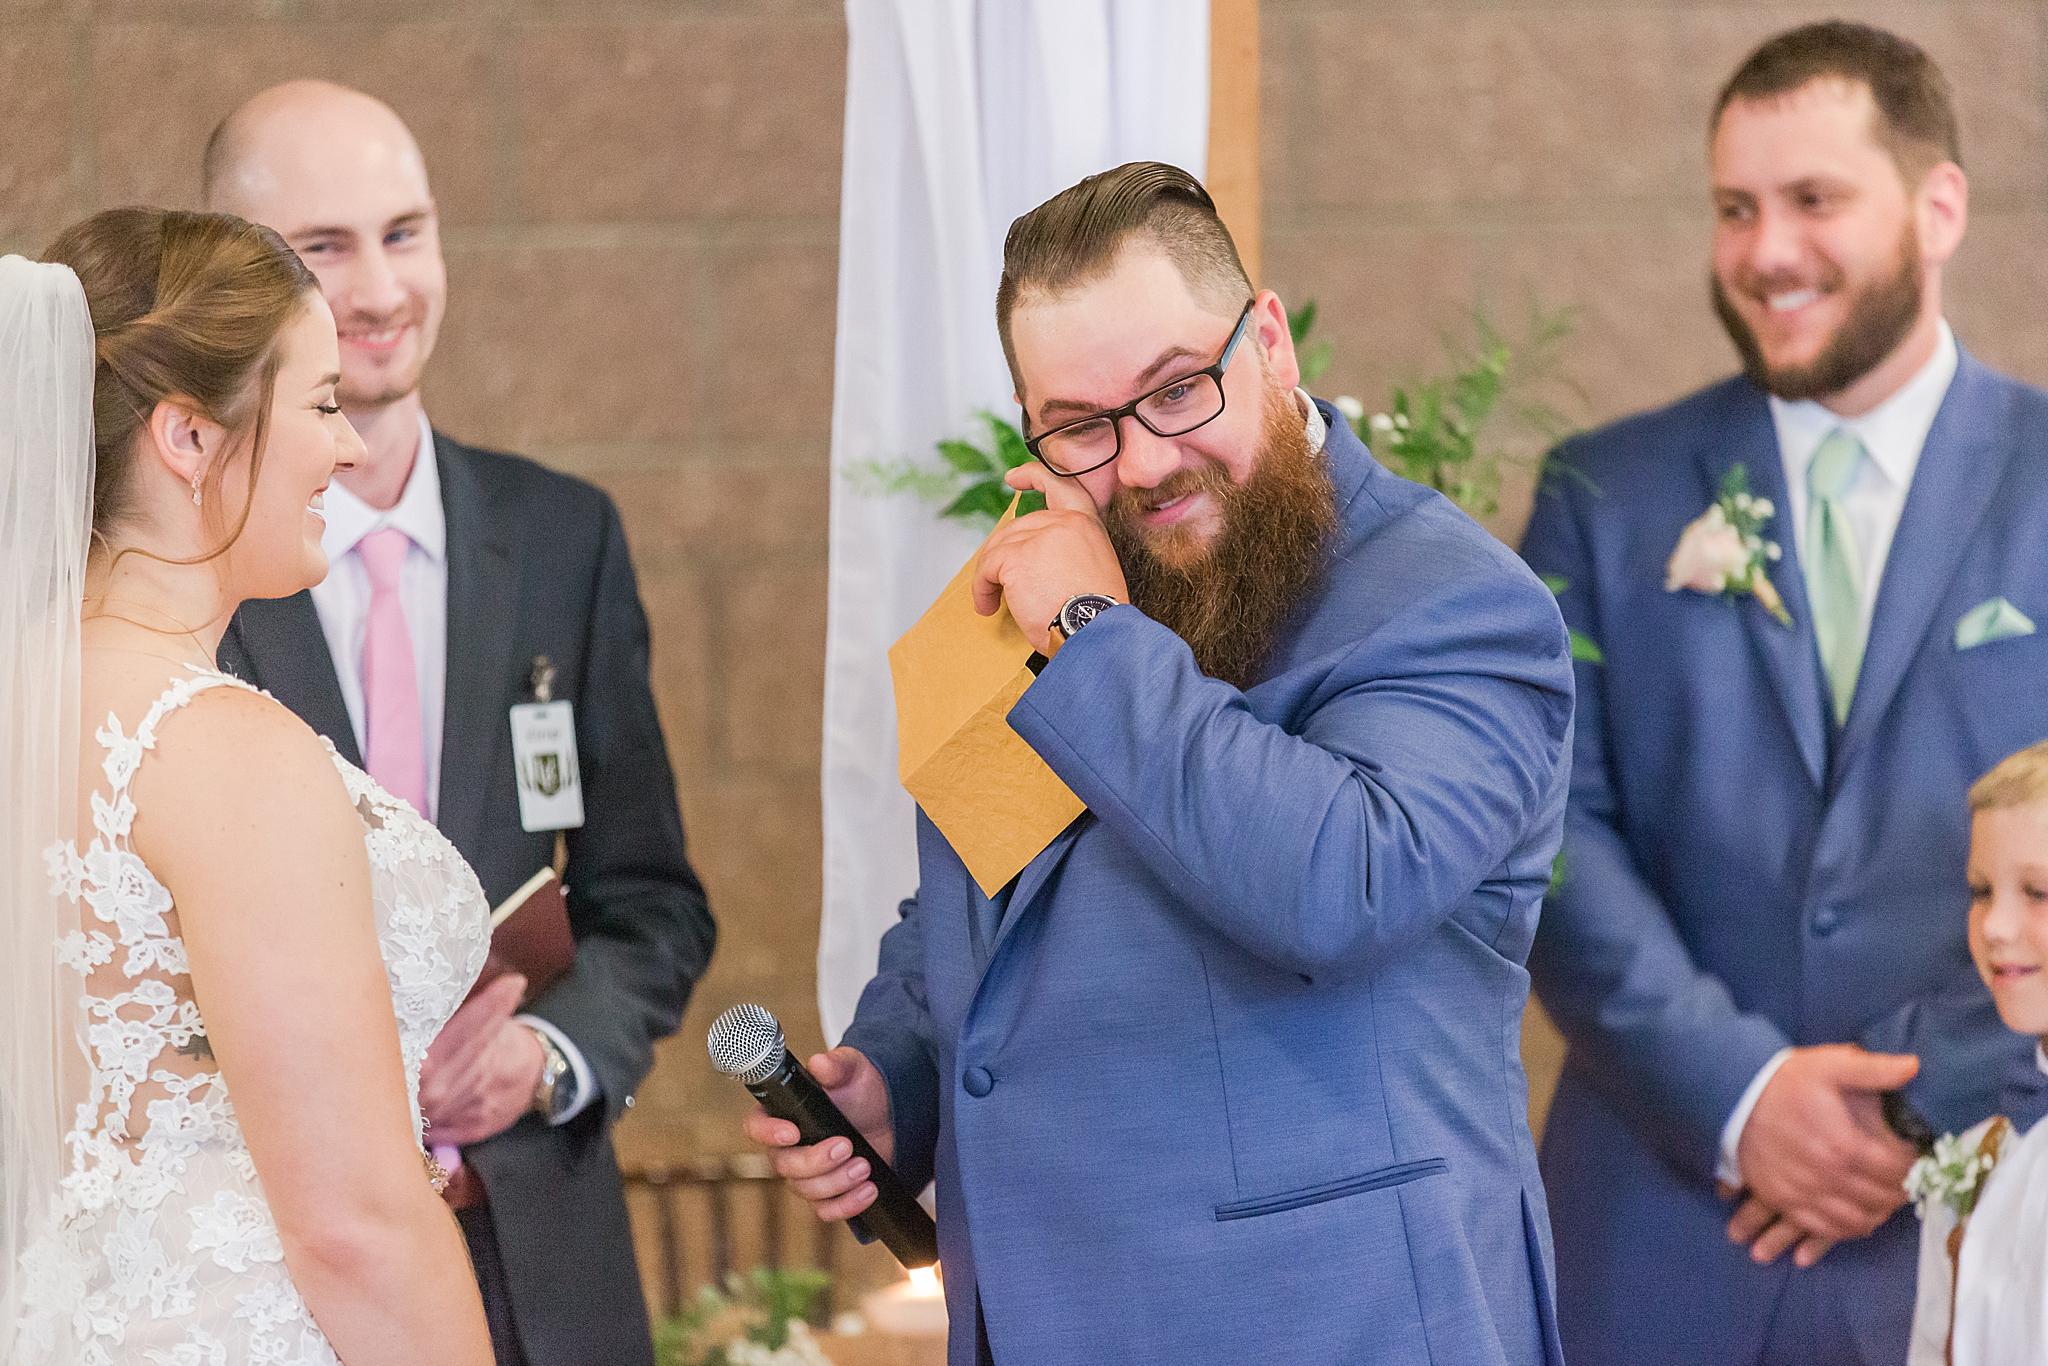 detroit-wedding-photographer-brownstown-event-center-wedding-photos-sam-josh-by-courtney-carolyn-photography_0039.jpg